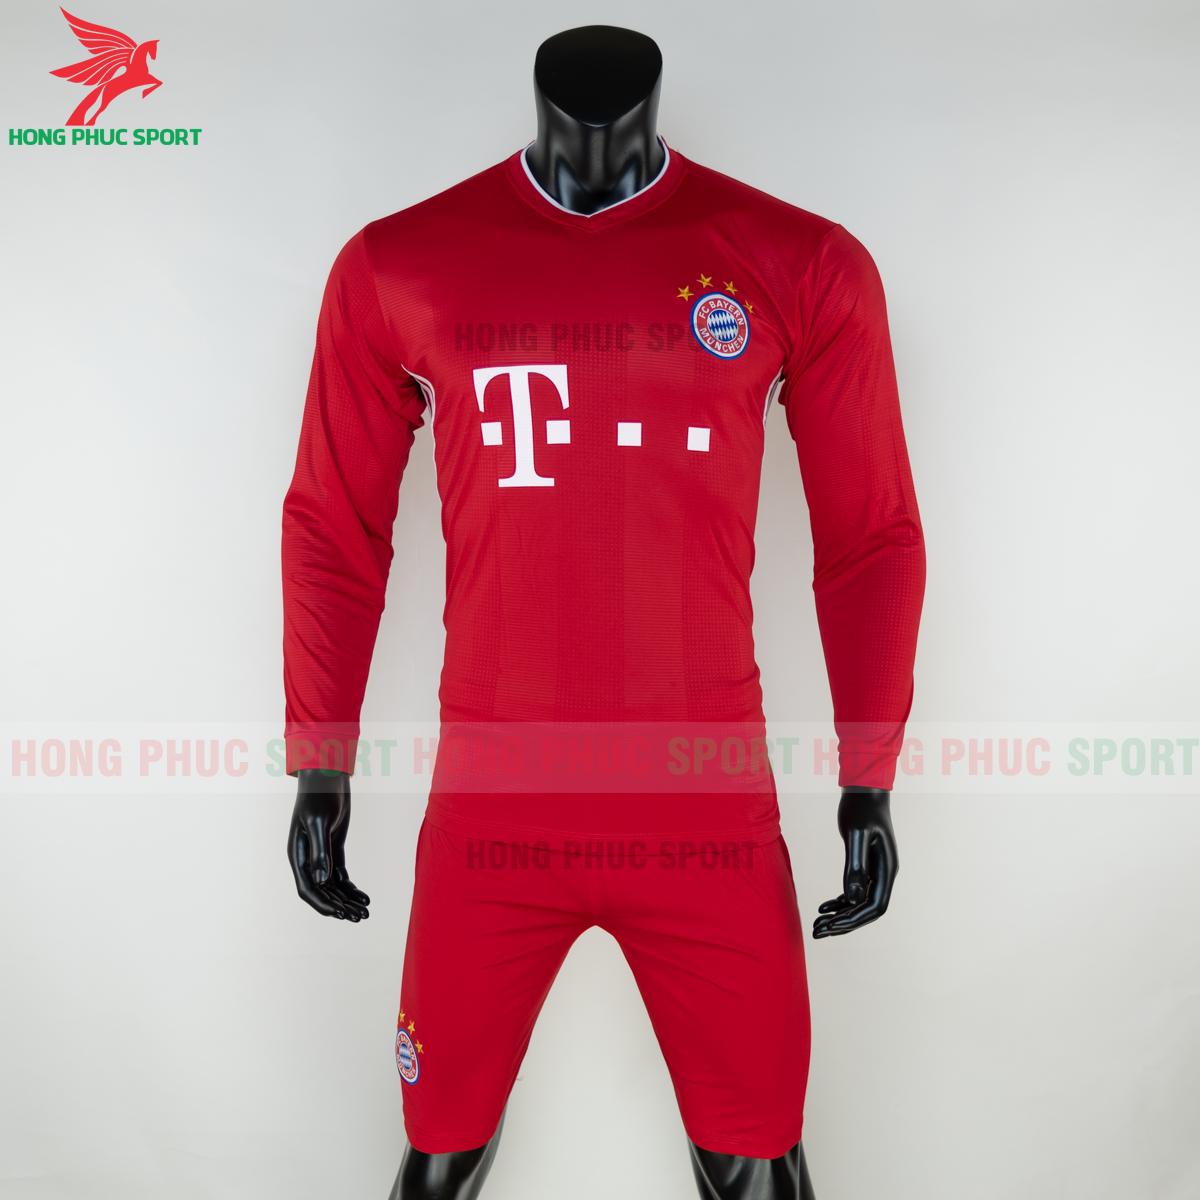 https://cdn.hongphucsport.com/unsafe/s4.shopbay.vn/files/285/ao-dai-tay-bayern-munich-2020-san-nha-2-5f8fb9fa8acf5.png